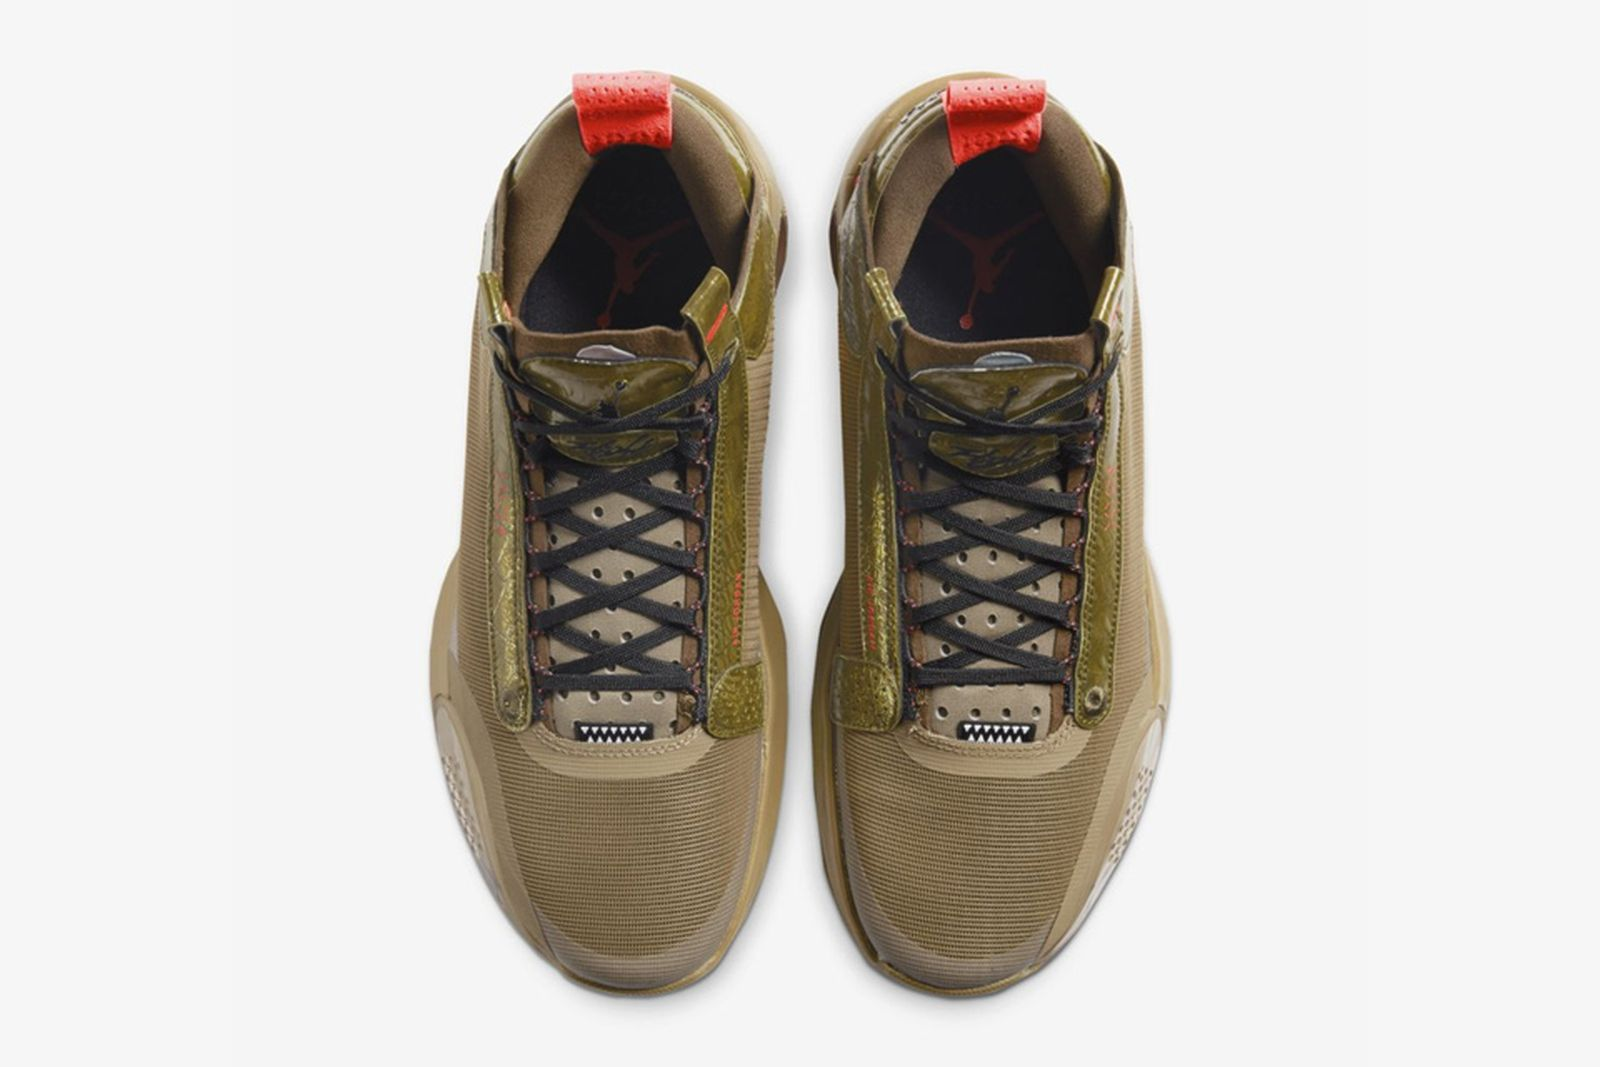 nike-air-jordan-34-bayou-boys-release-date-price-03